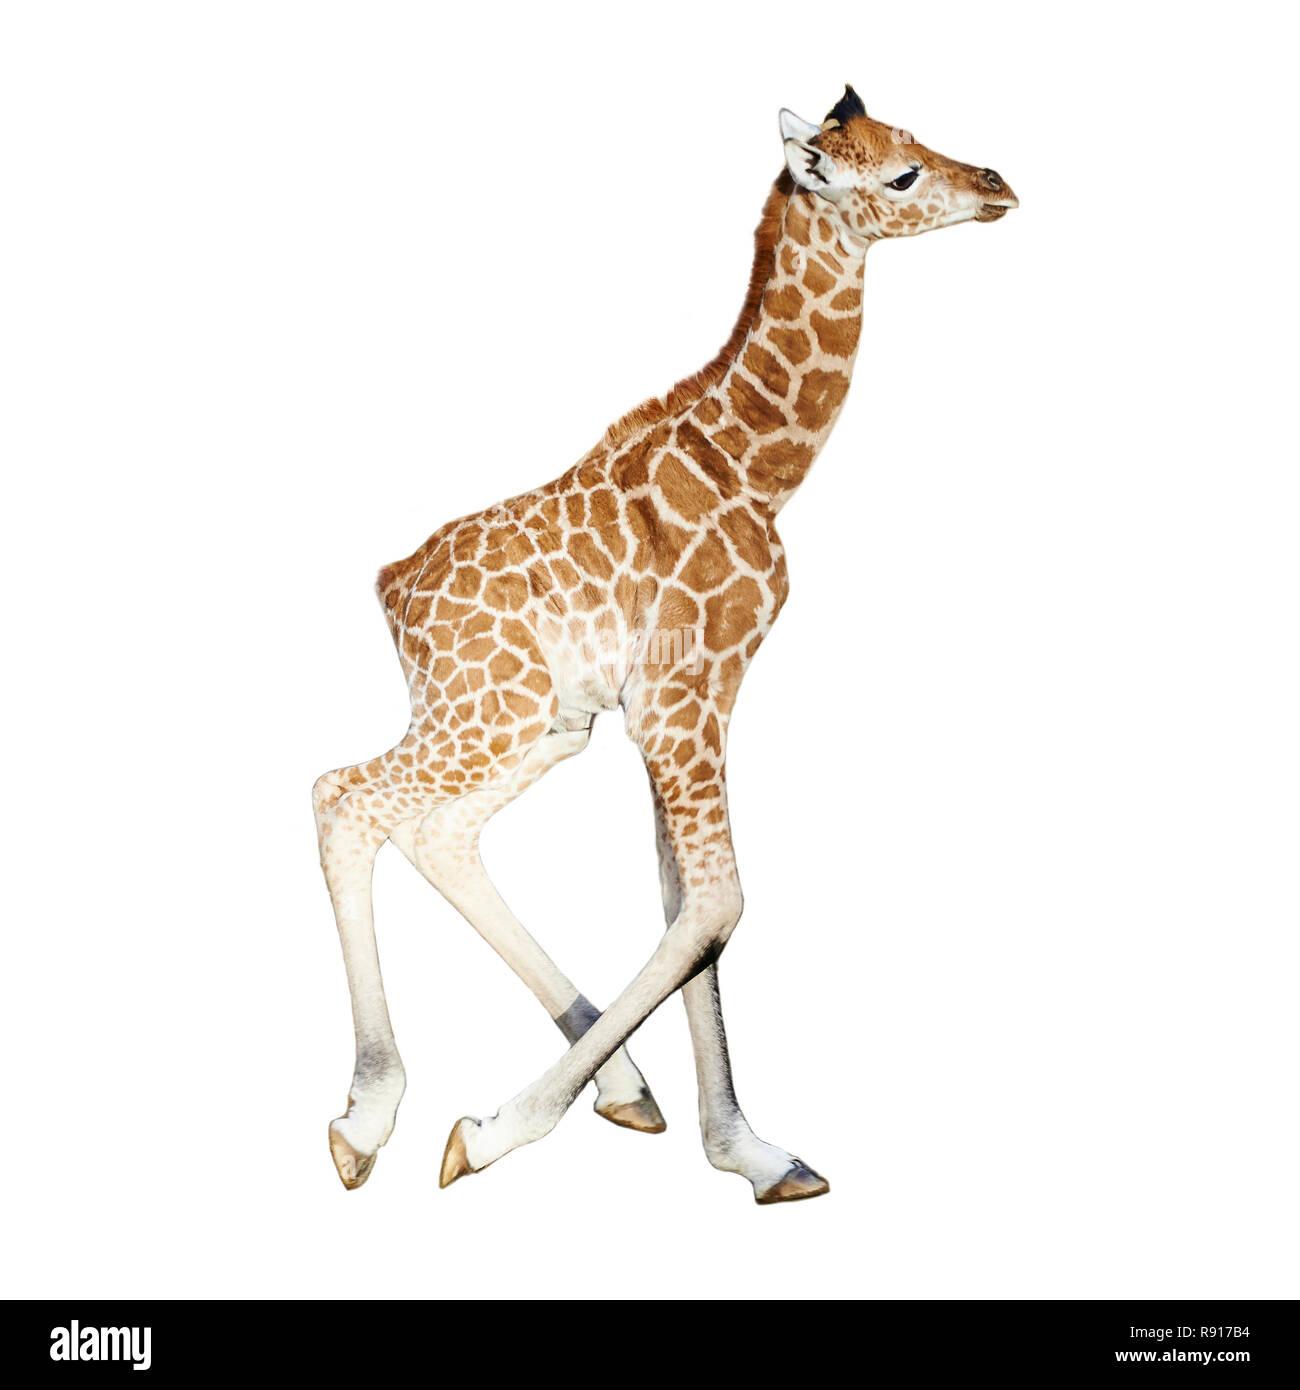 Young child giraffe running, isolated on white background Stock Photo